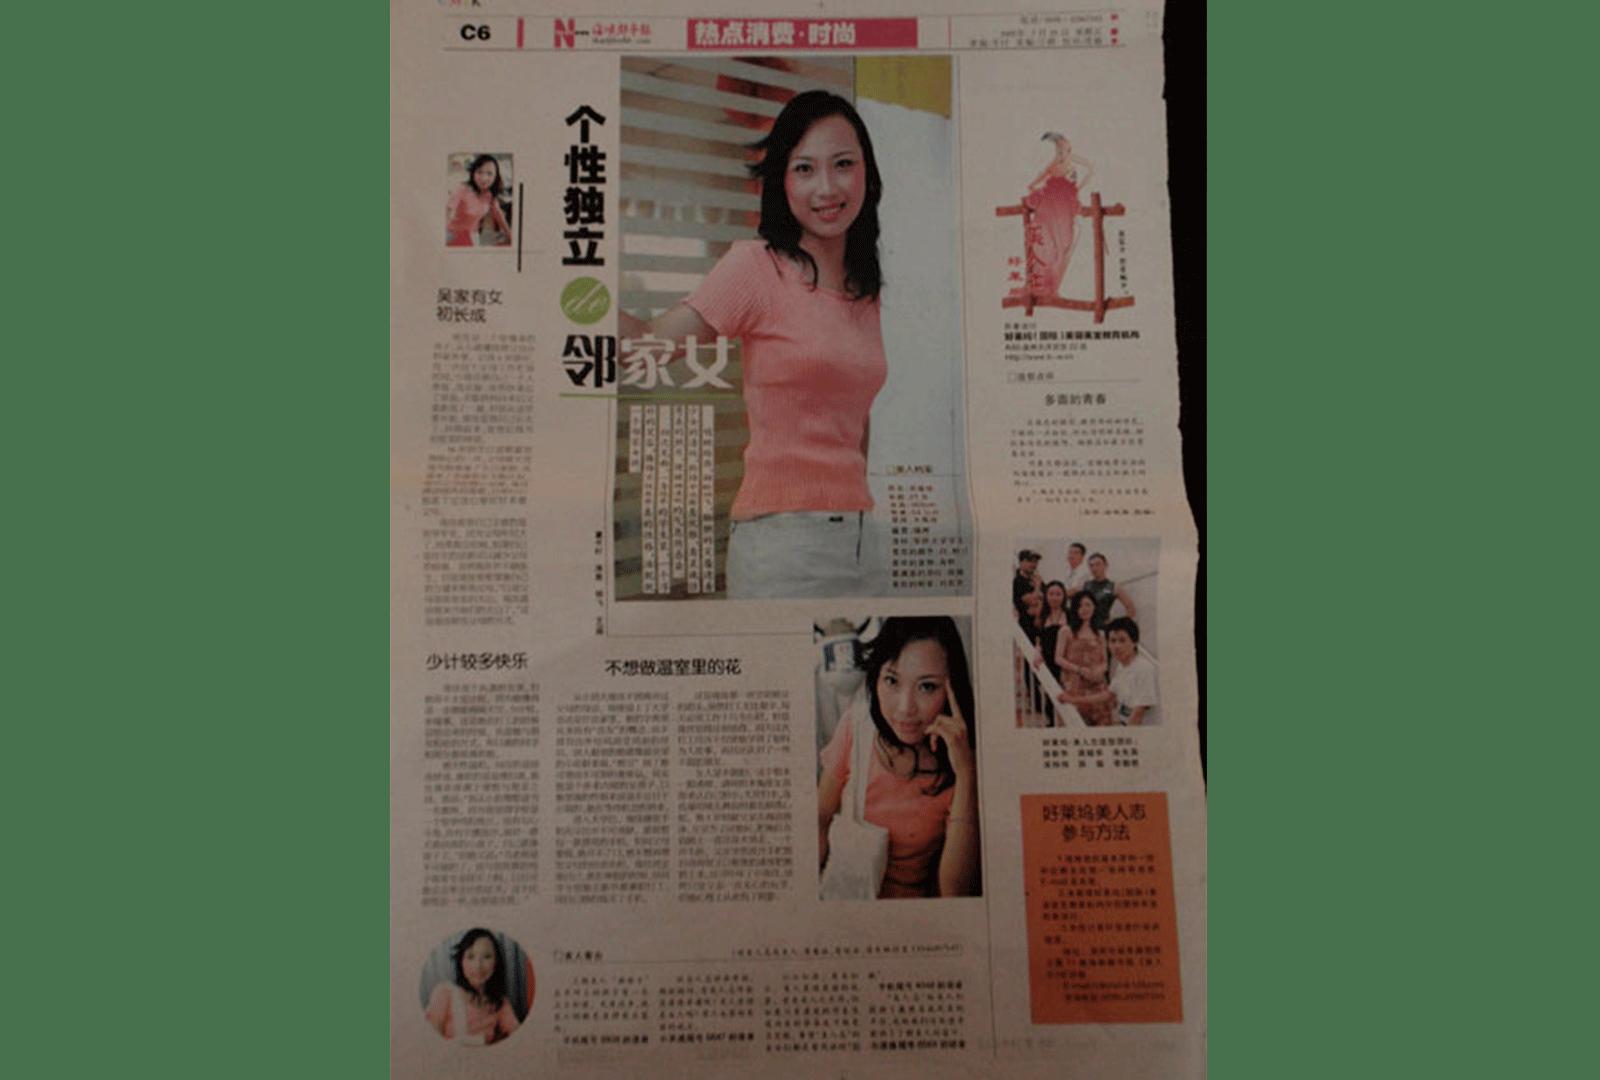 _0000s_0009_海峡都市报-2005-7-29-热点消费·时尚